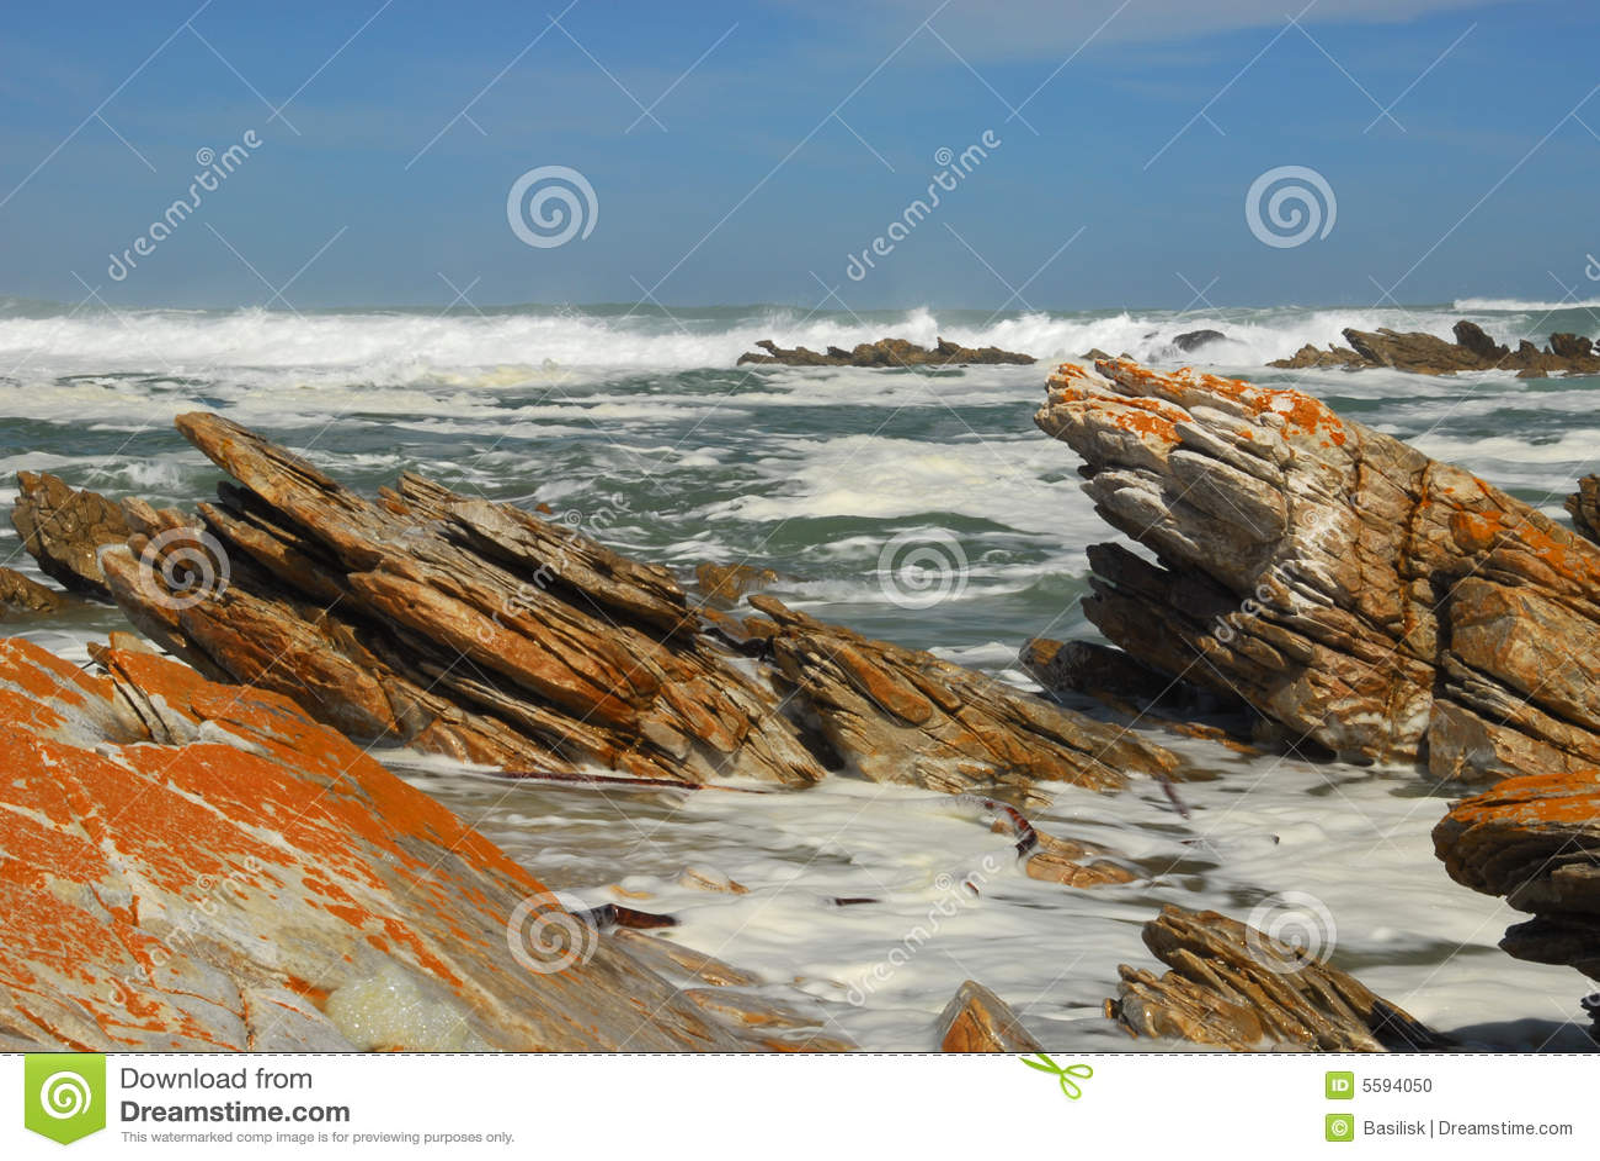 плаща-накидк пляжа agulhas утесистая